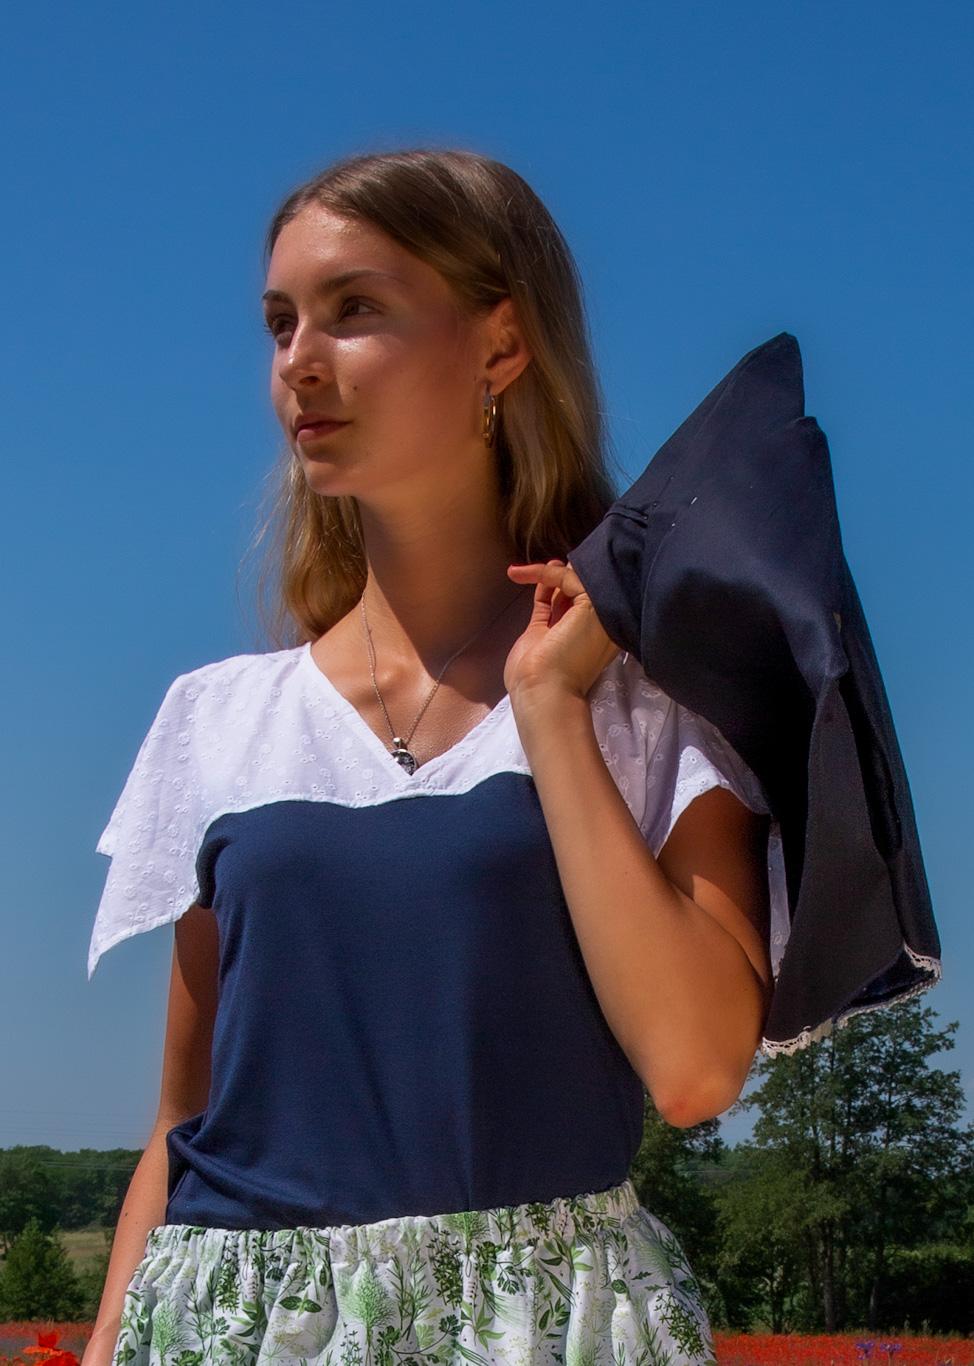 Tunika-Shirt Blau weiße Spitze